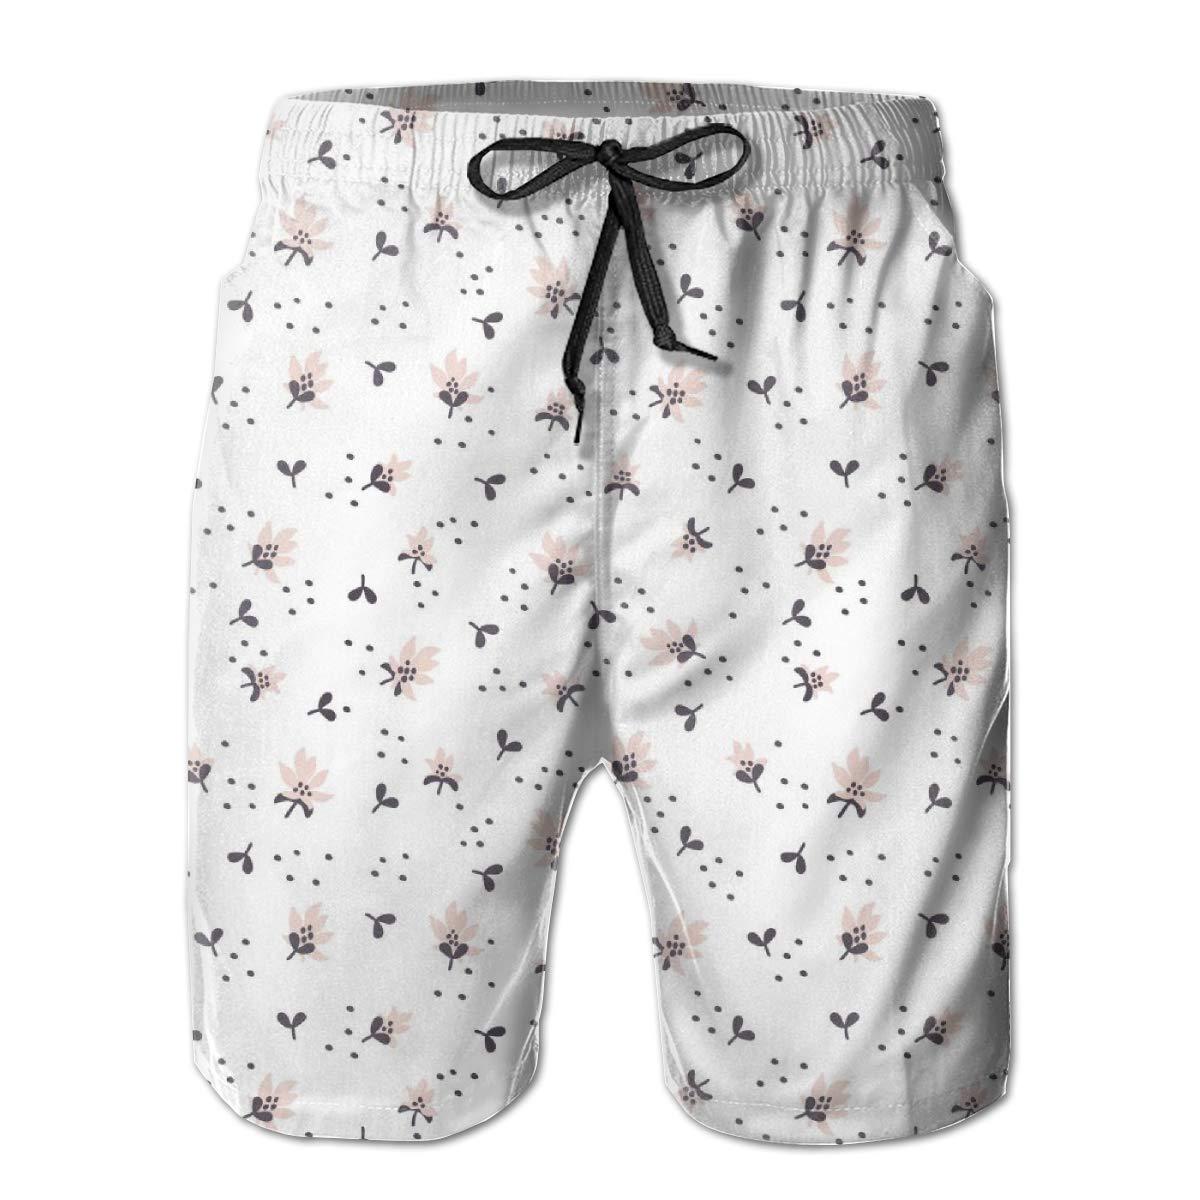 Yeates Flower Mens Swim Trunks Quick Dry Fashion Jasmine Pattern Printed Summer Beach Shorts Board Beach Short